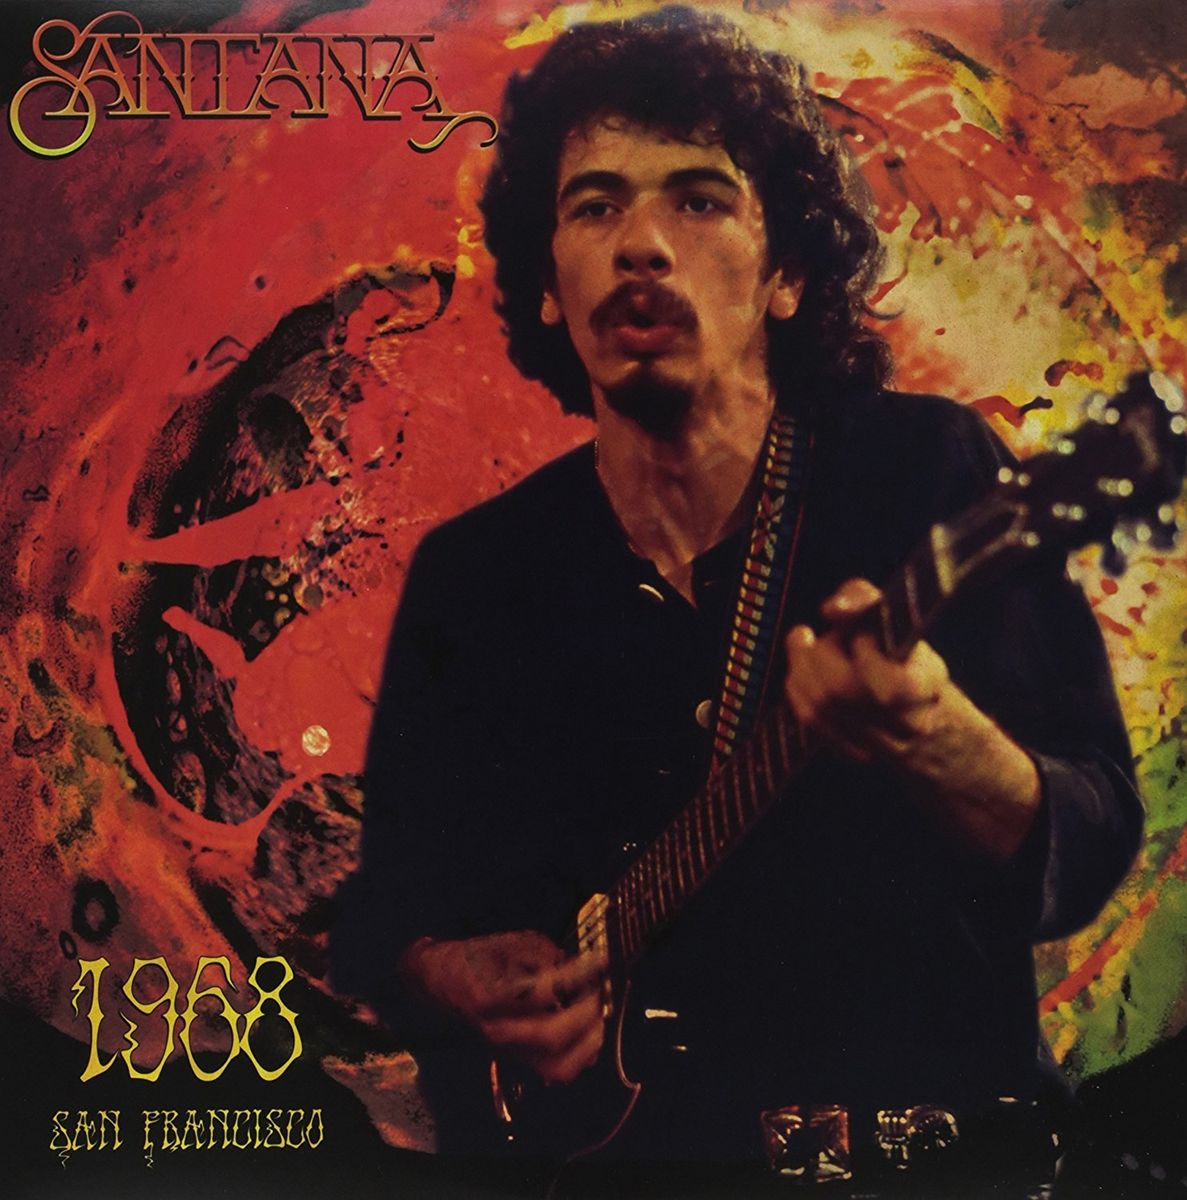 цена на Santana Santana. 1968 San Francisco (LP)